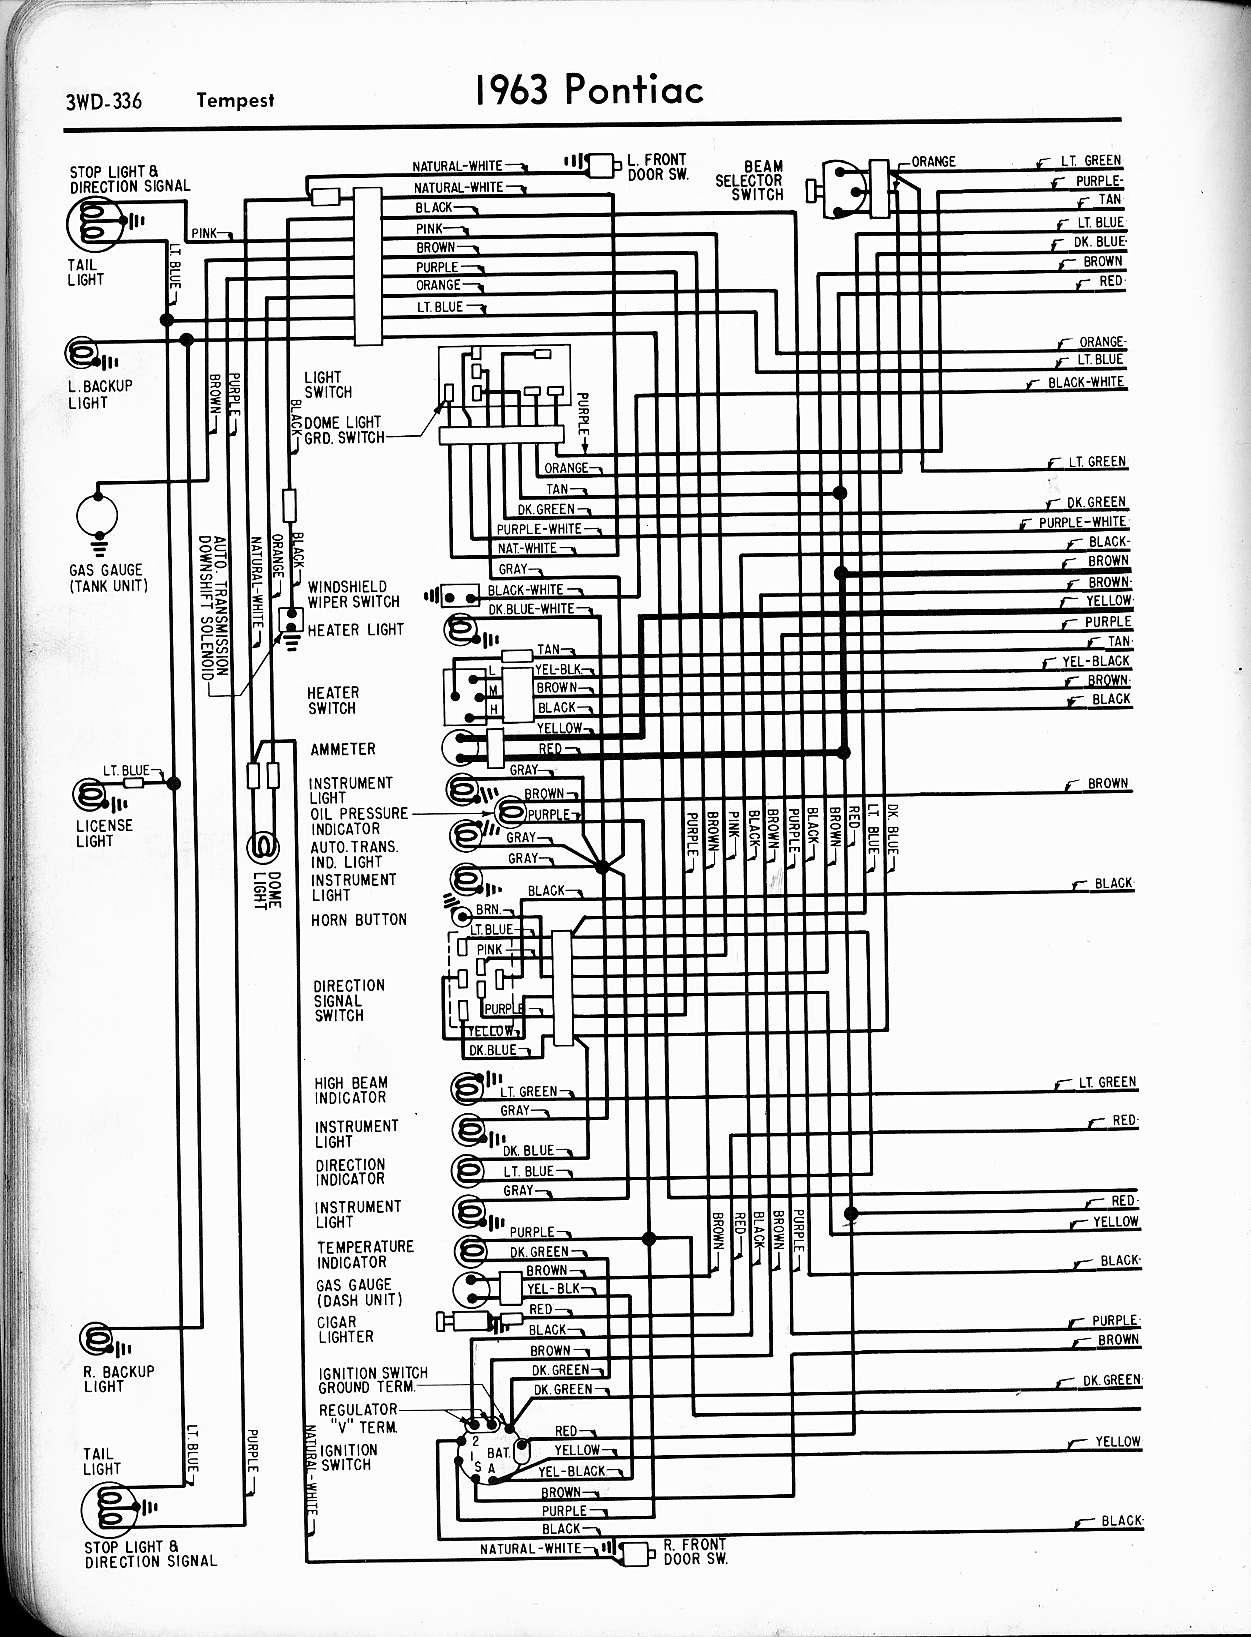 Terrific 1973 Firebird Wiring Diagram Diagram Data Schema Wiring Cloud Aboleophagdienstapotheekhoekschewaardnl